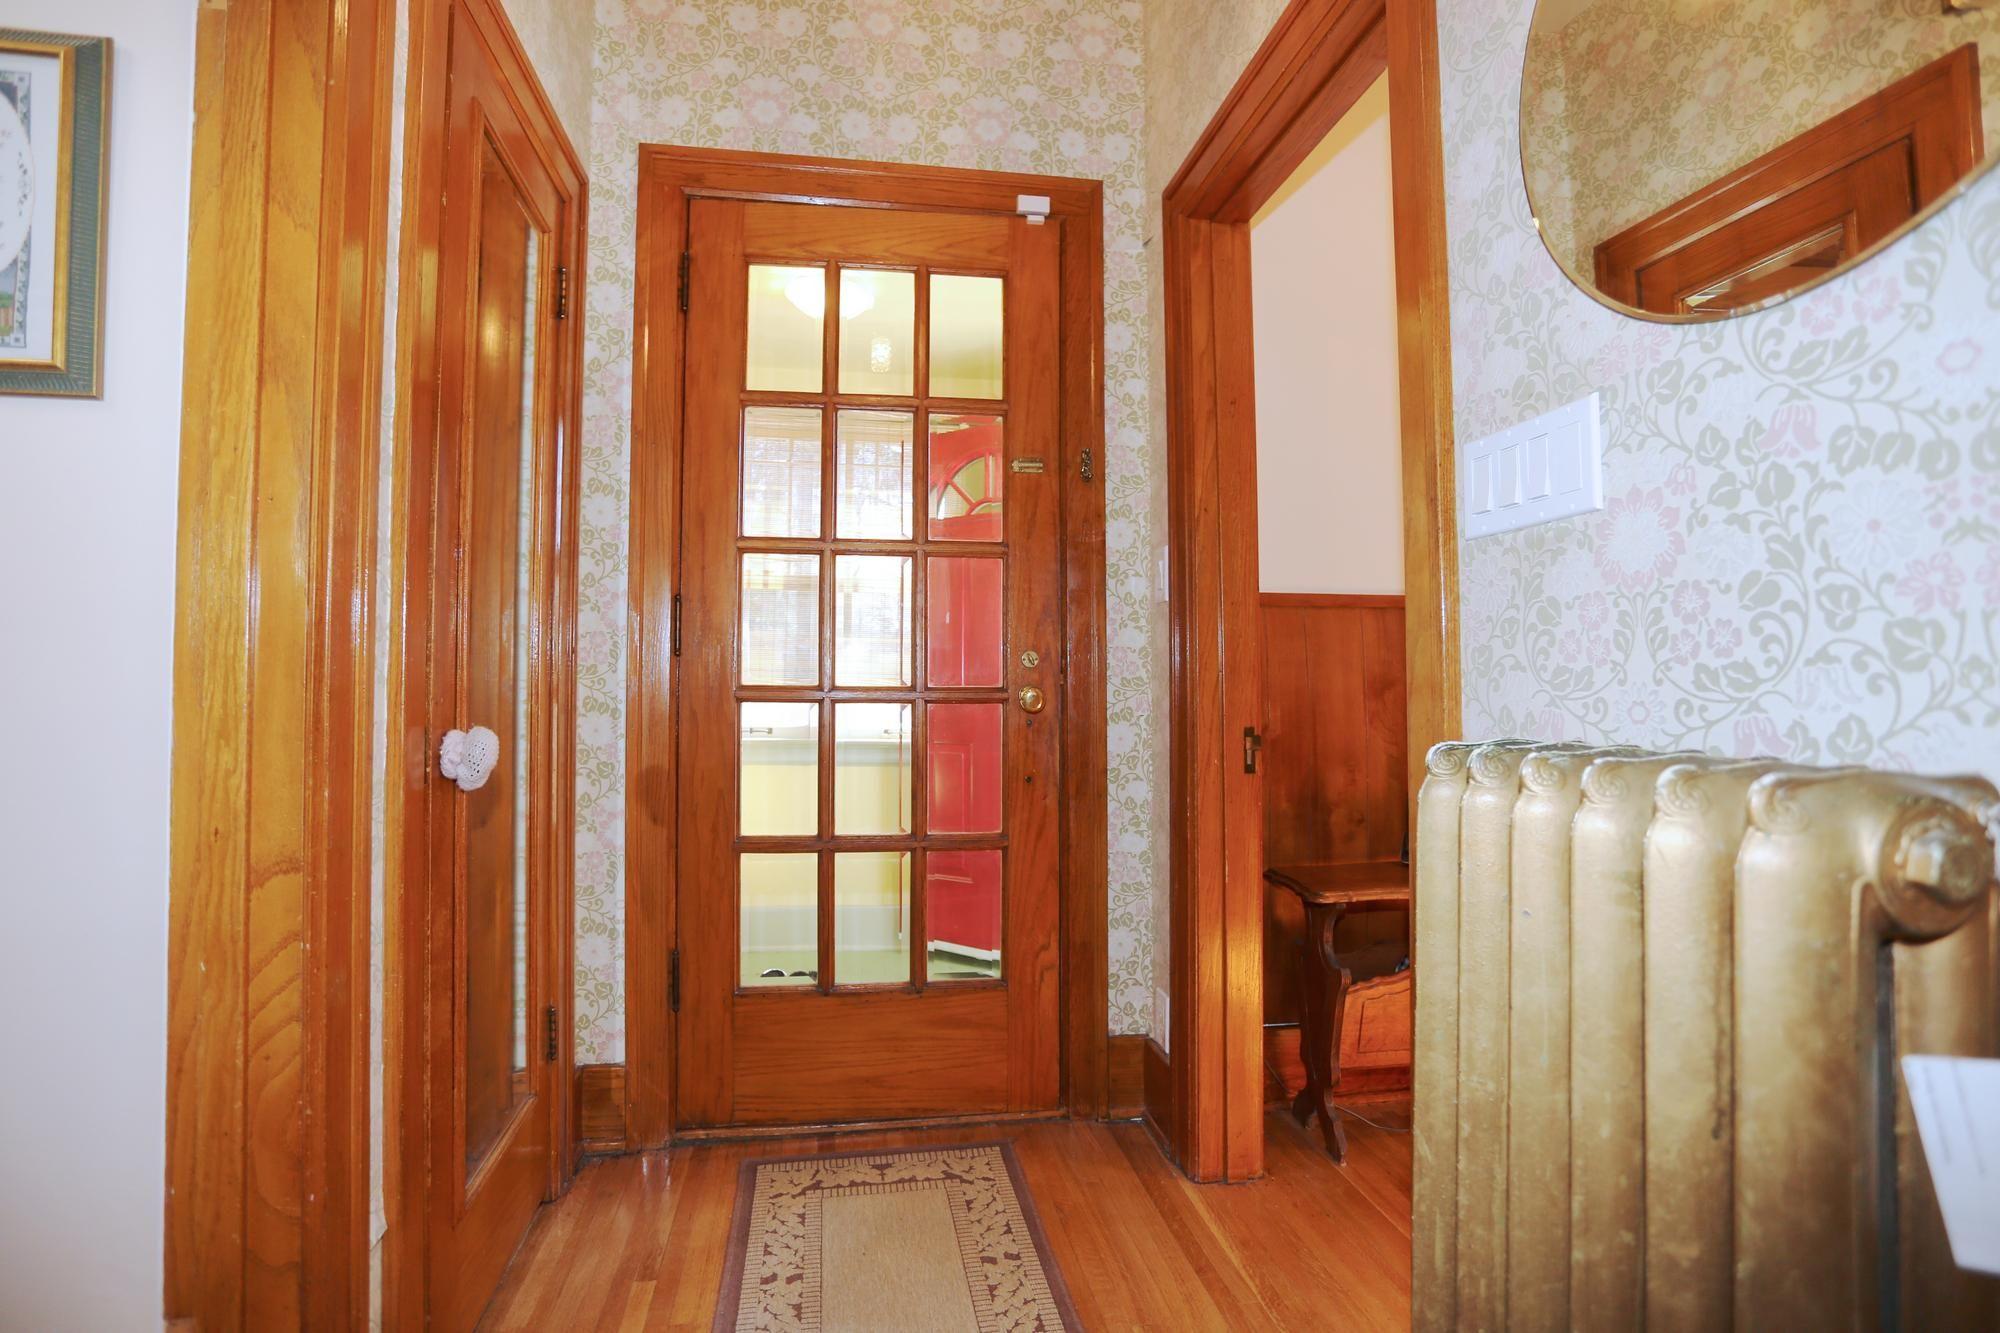 Photo 5: Photos: 109 Garfield Street South in Winnipeg: Wolseley Single Family Detached for sale (5B)  : MLS®# 1808340